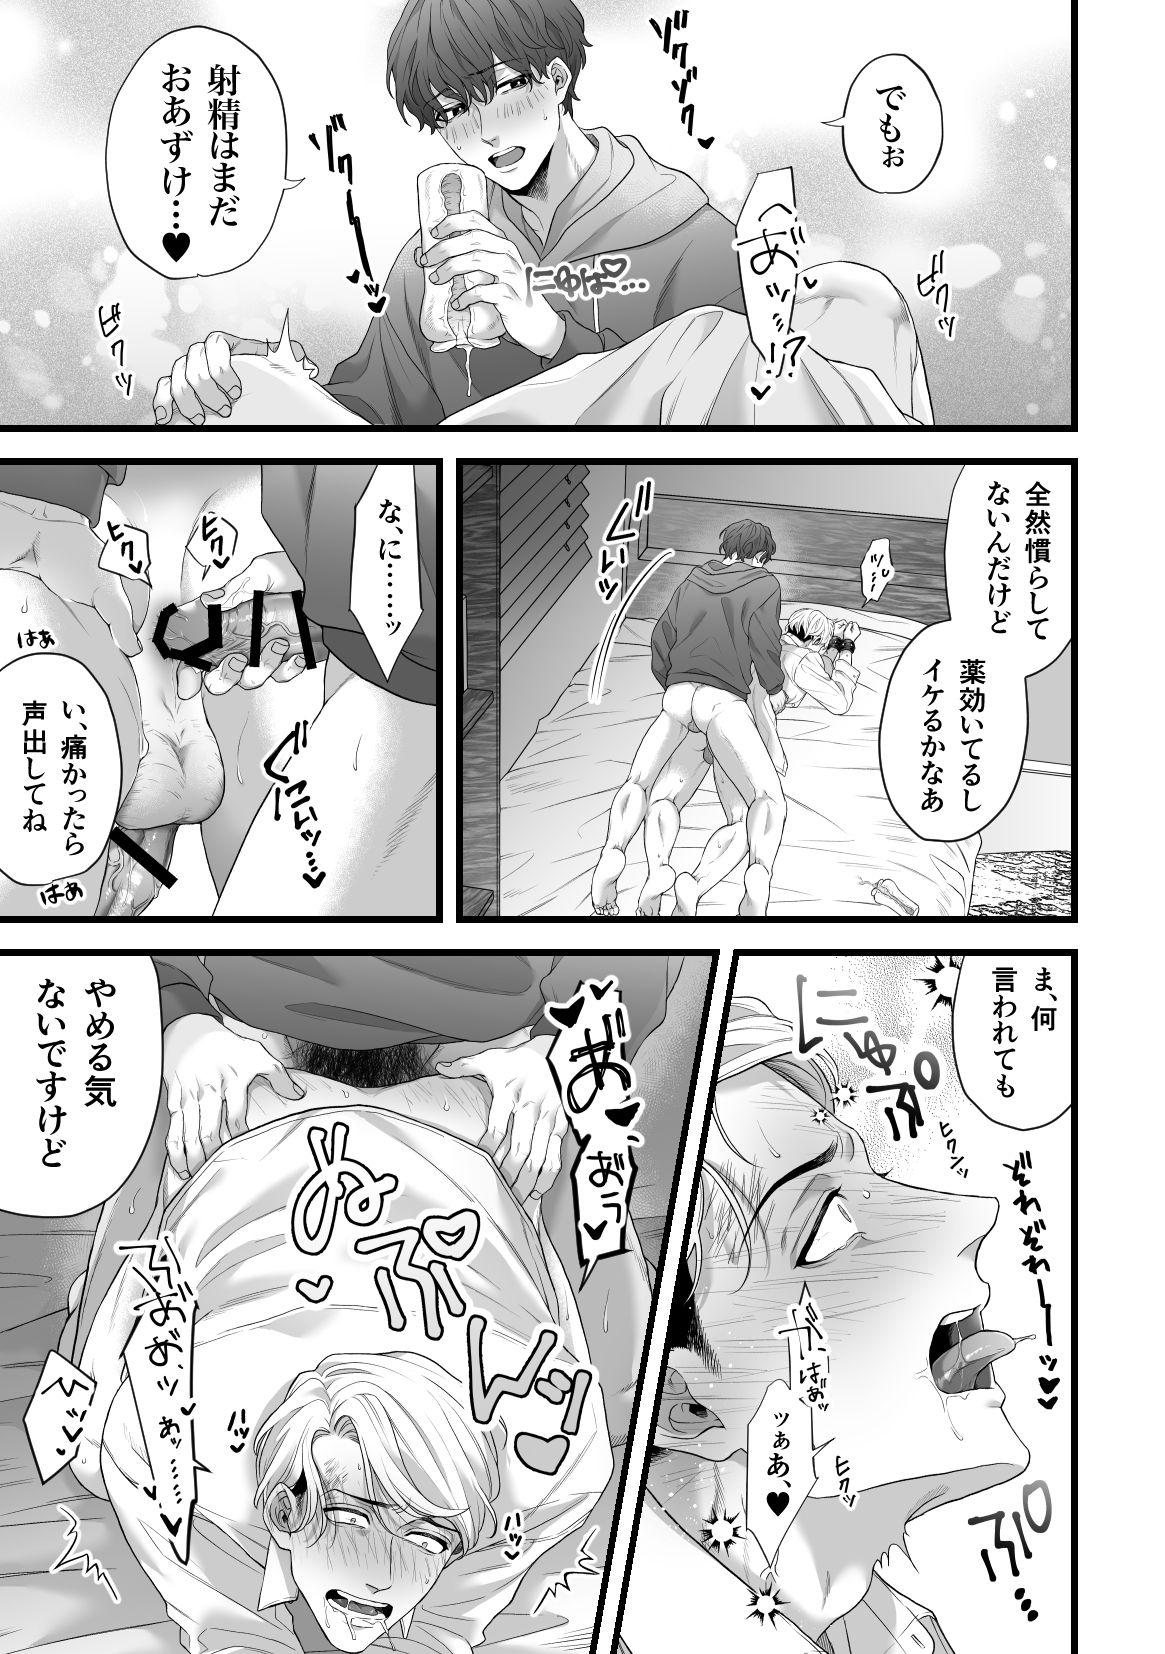 Gikei Ryoujoku 16